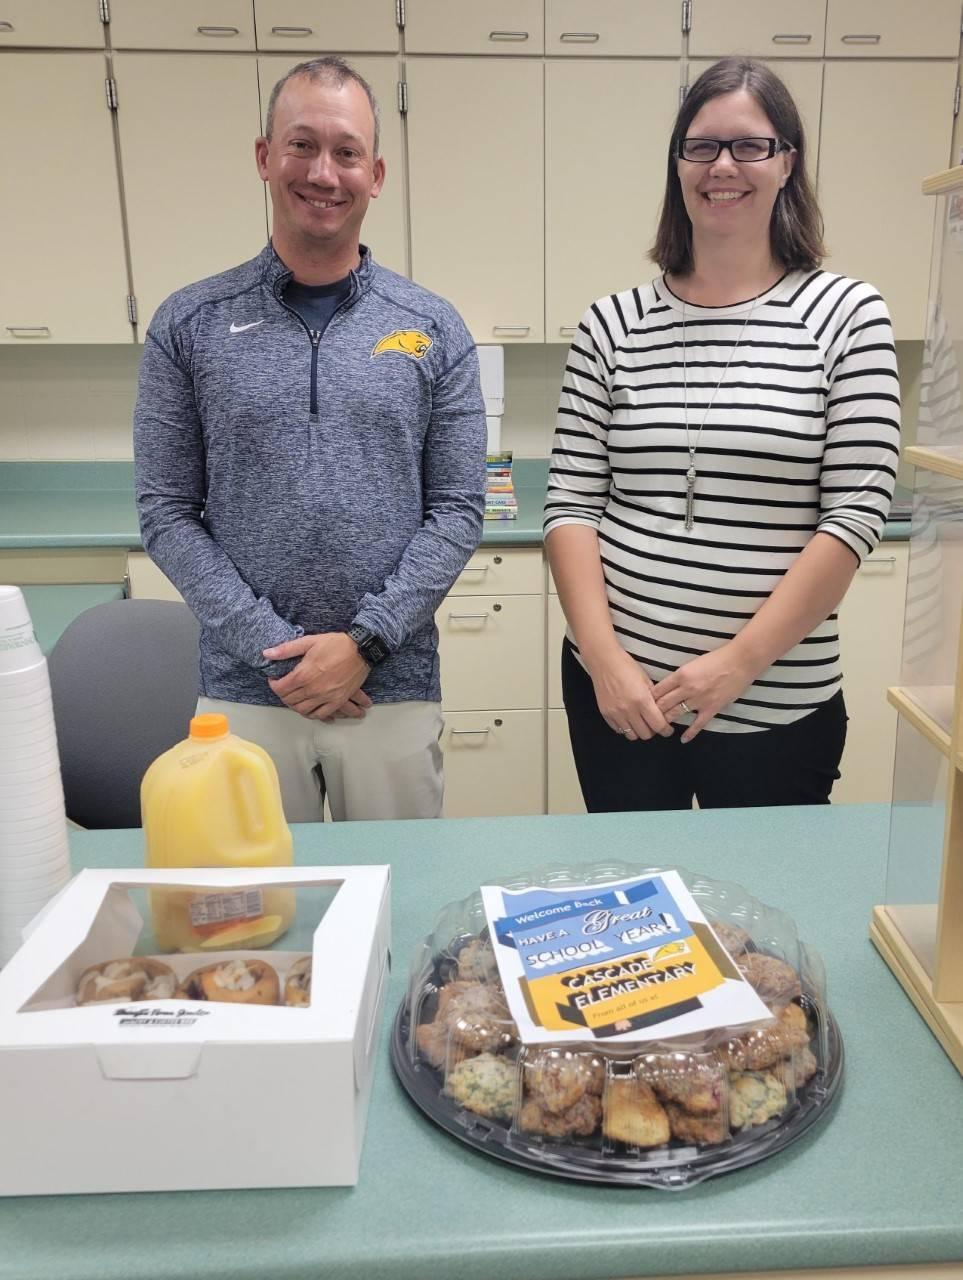 Ohnward Bank delivers breakfast for staff